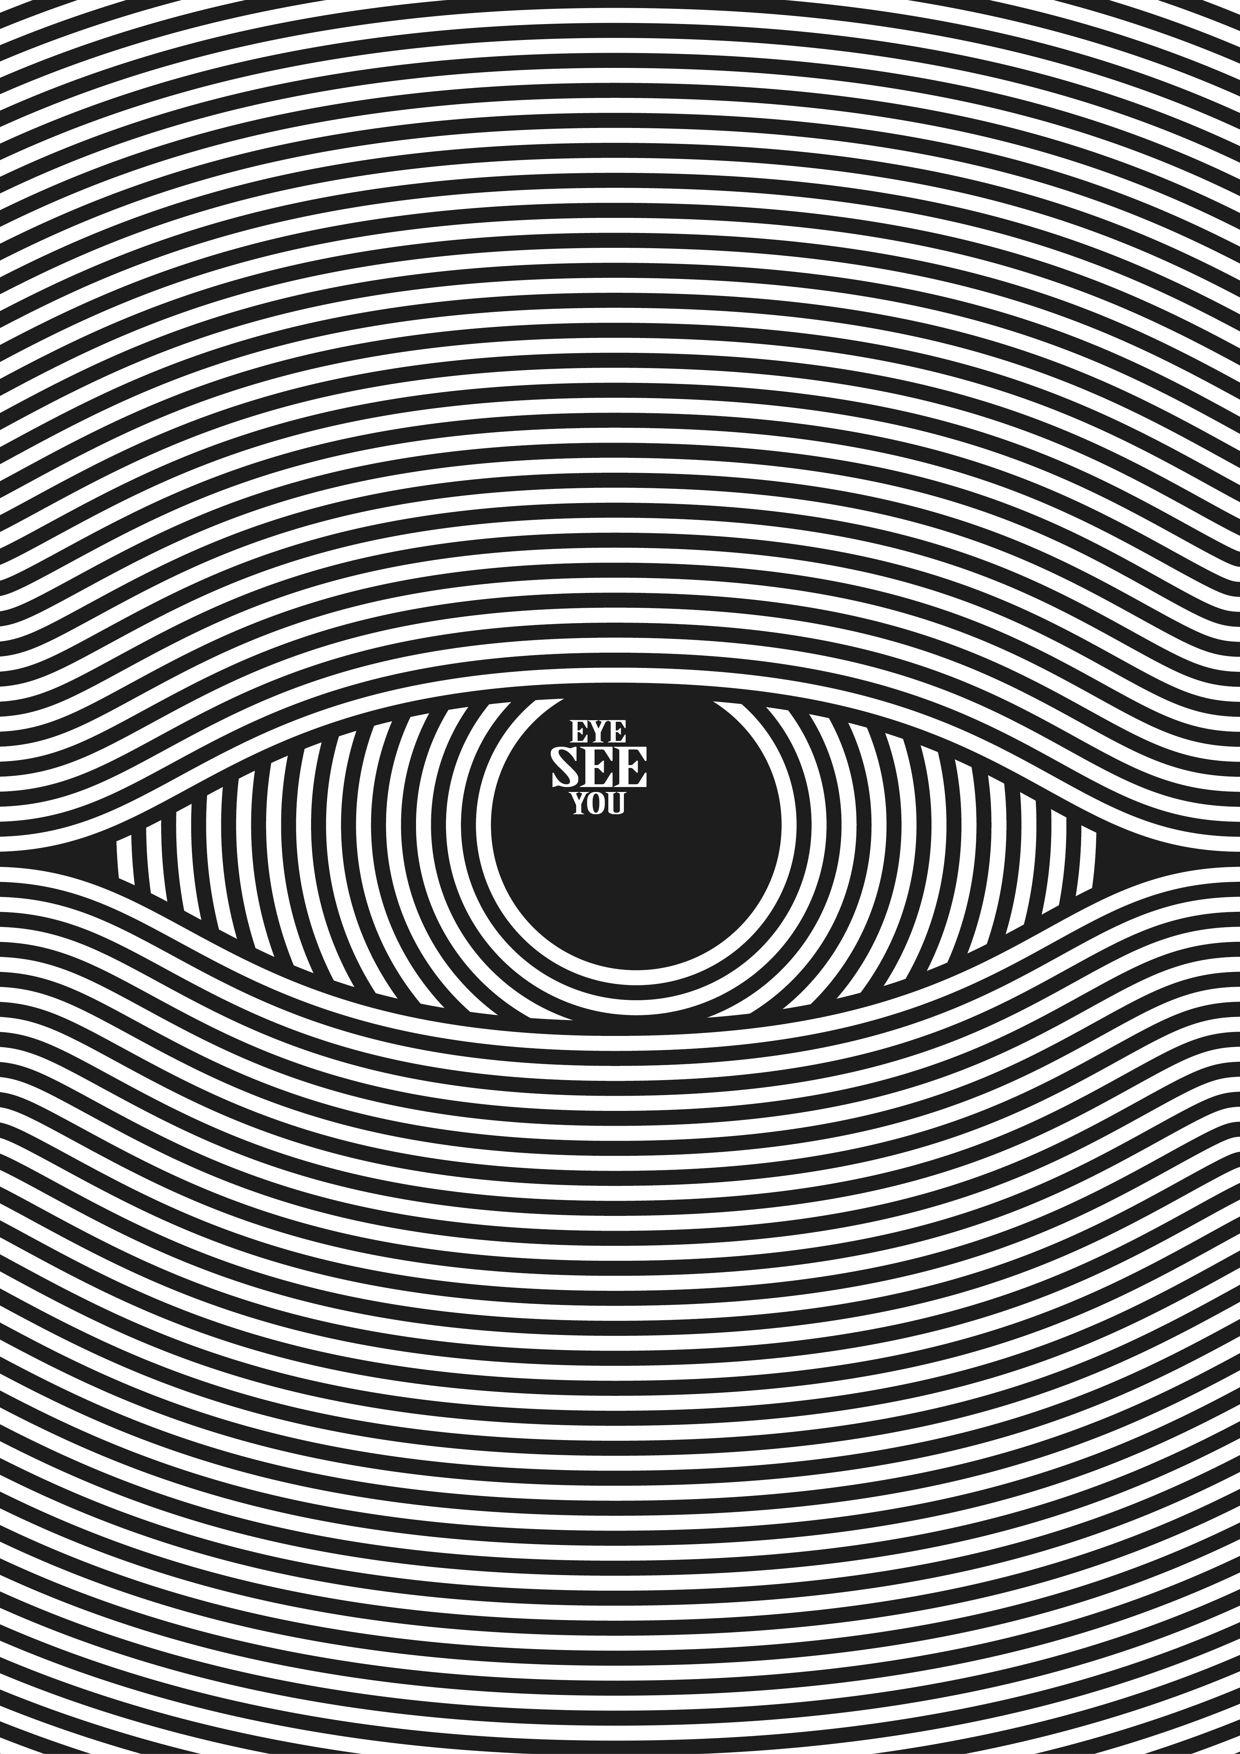 eye see you by franck nederstigt [ 1240 x 1754 Pixel ]